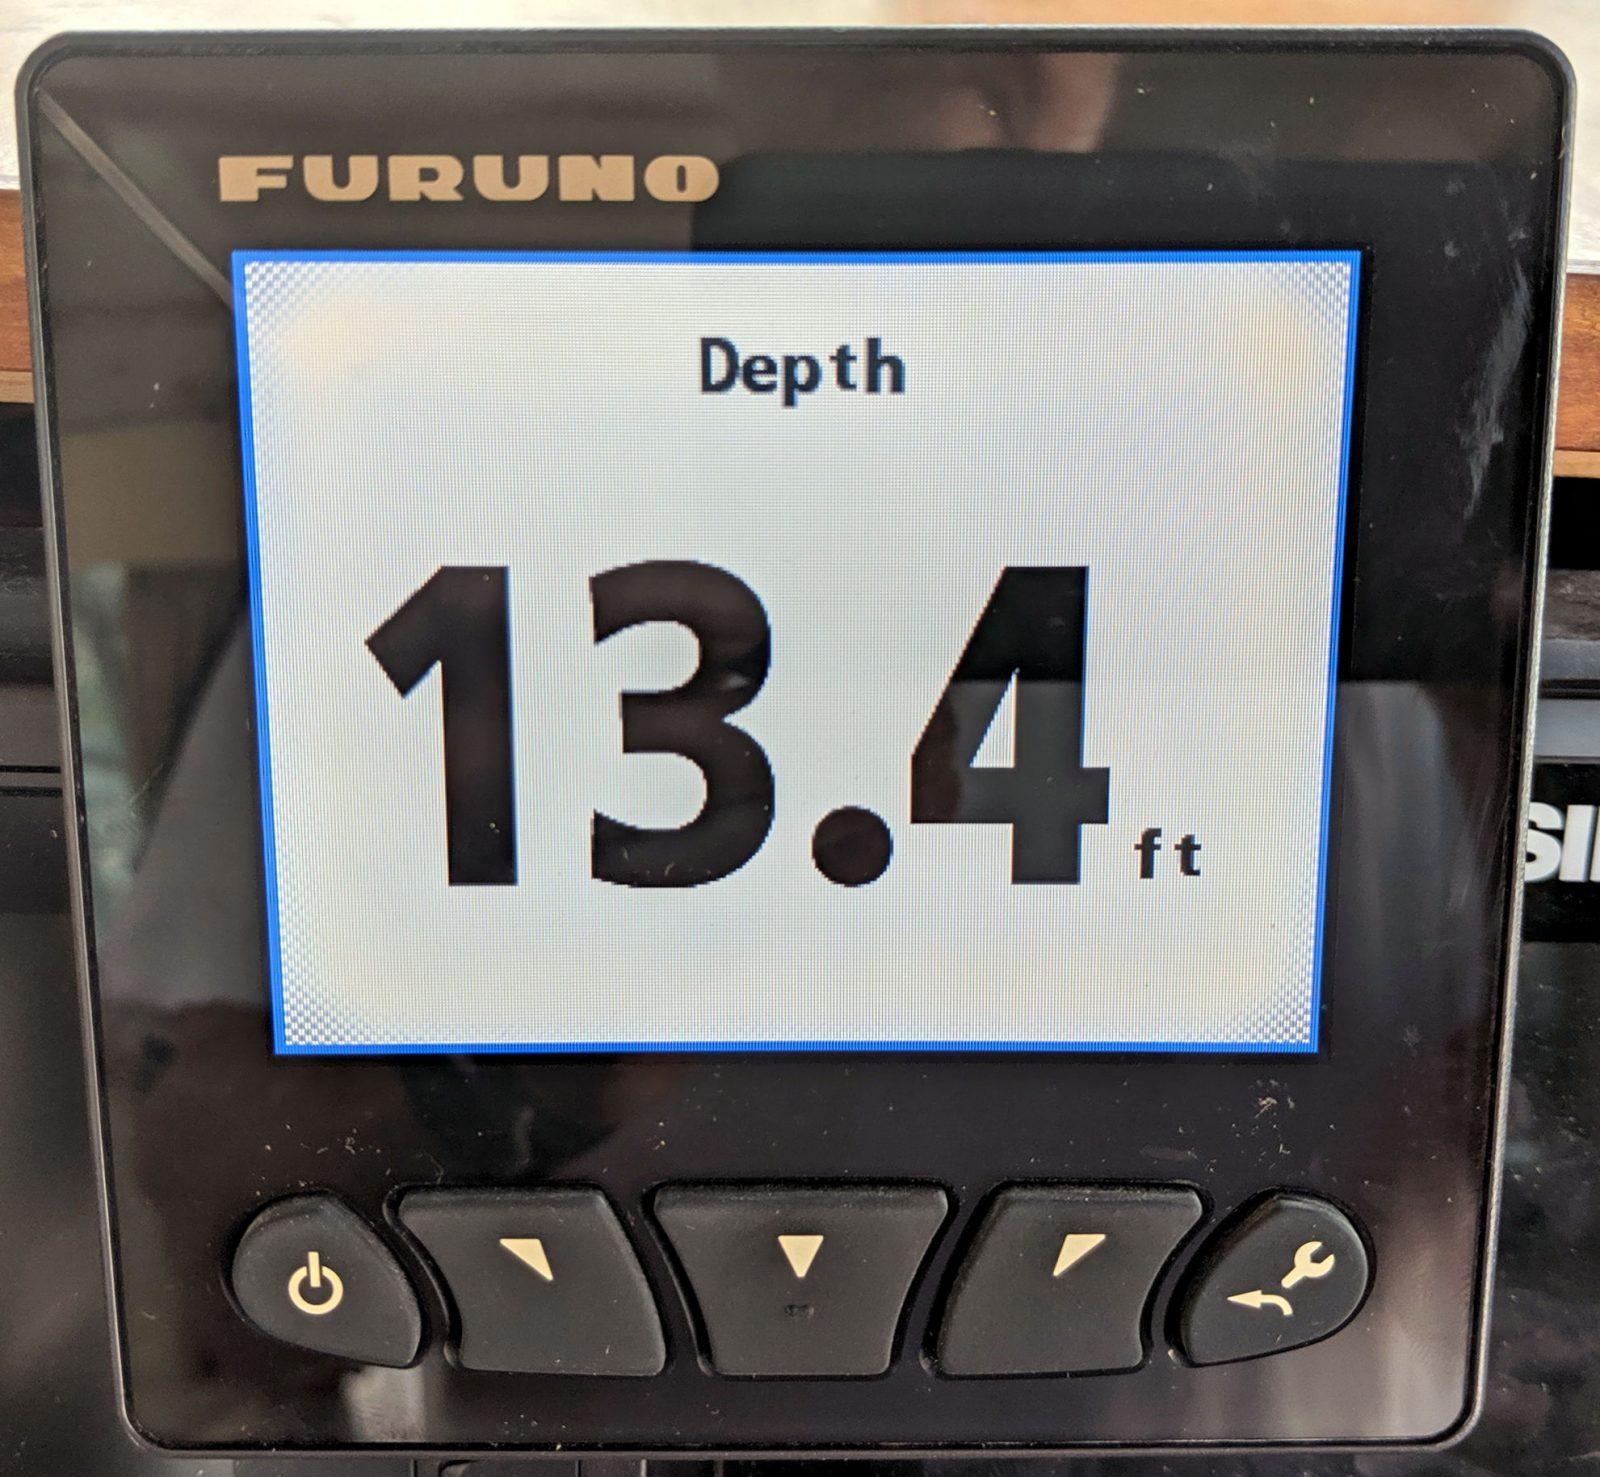 Furuno FI70 showing N2K Depth data in BIG digits